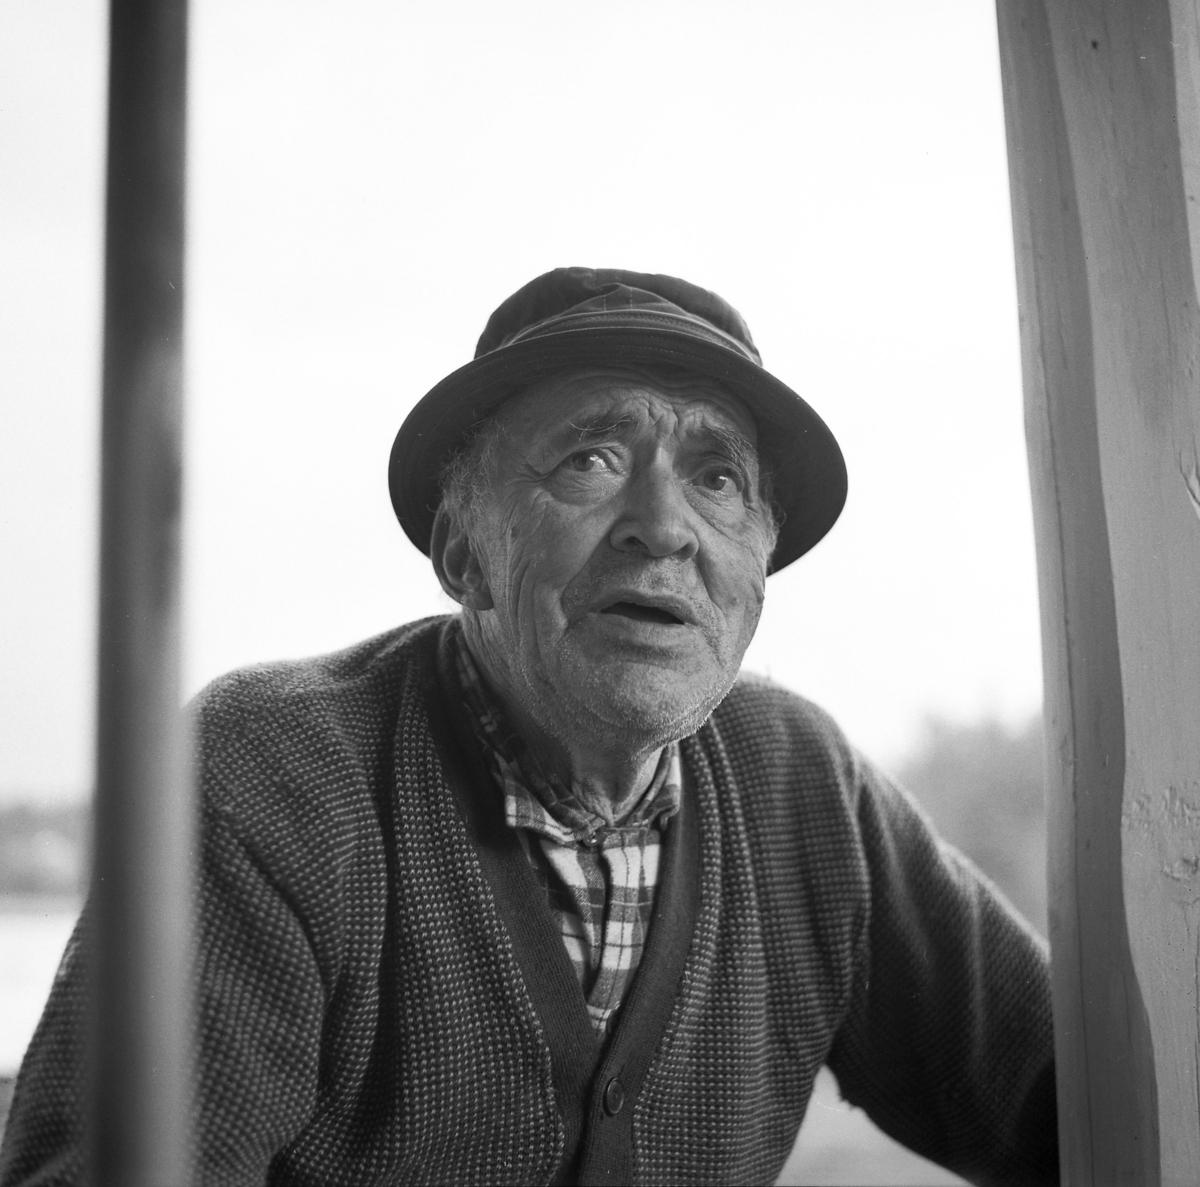 Olaf Flermoen